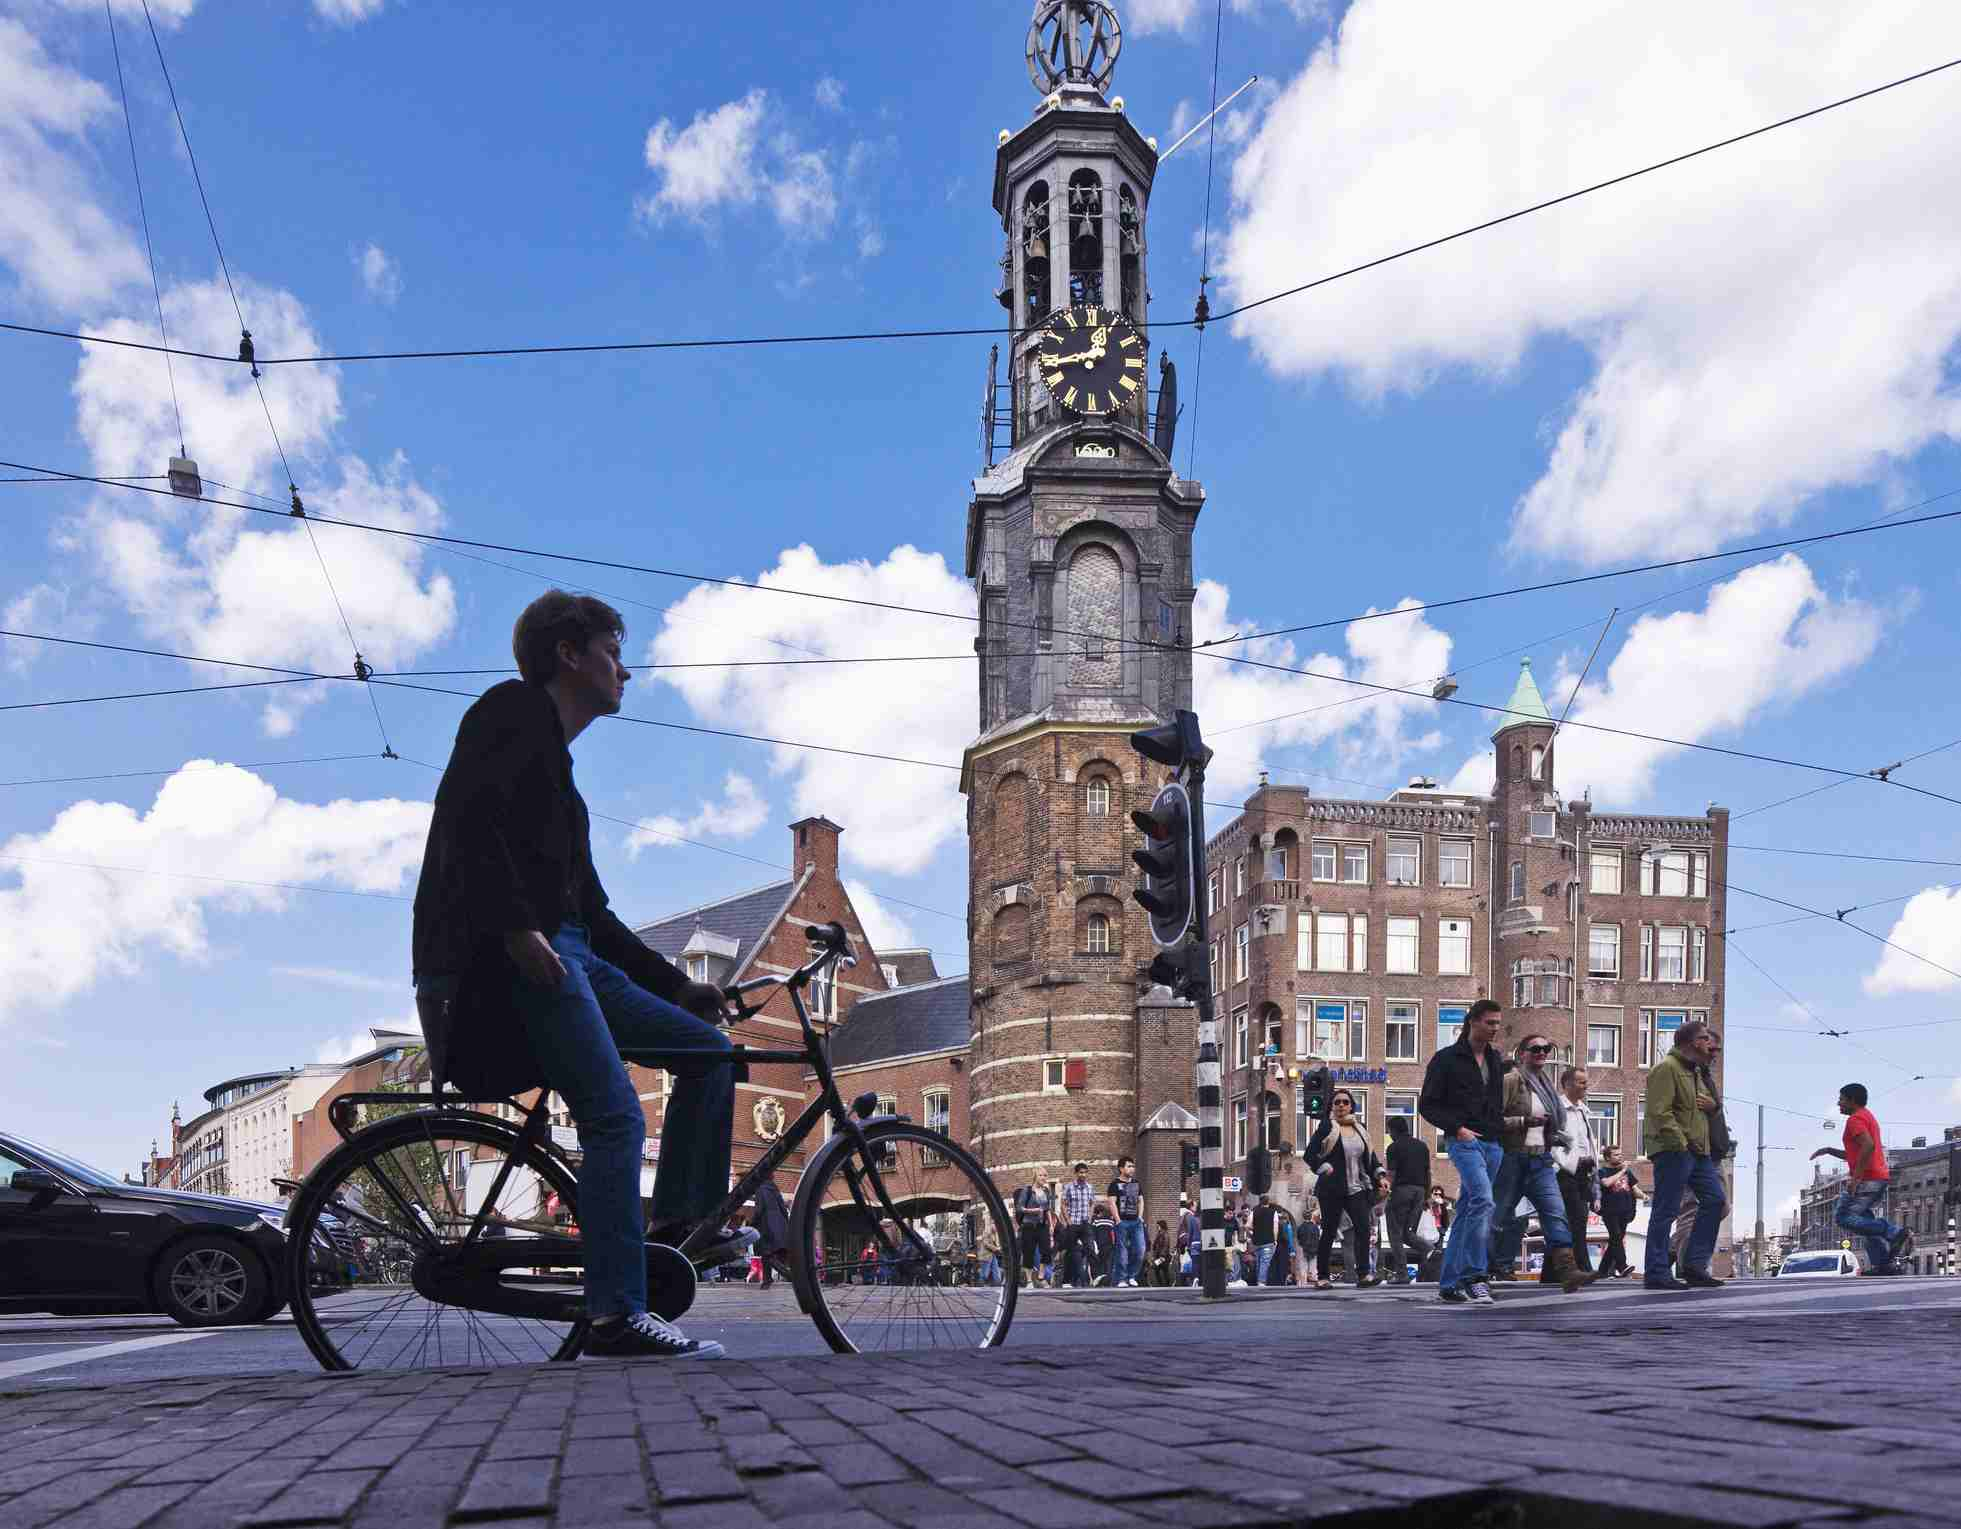 Bicycle near the Munttoren